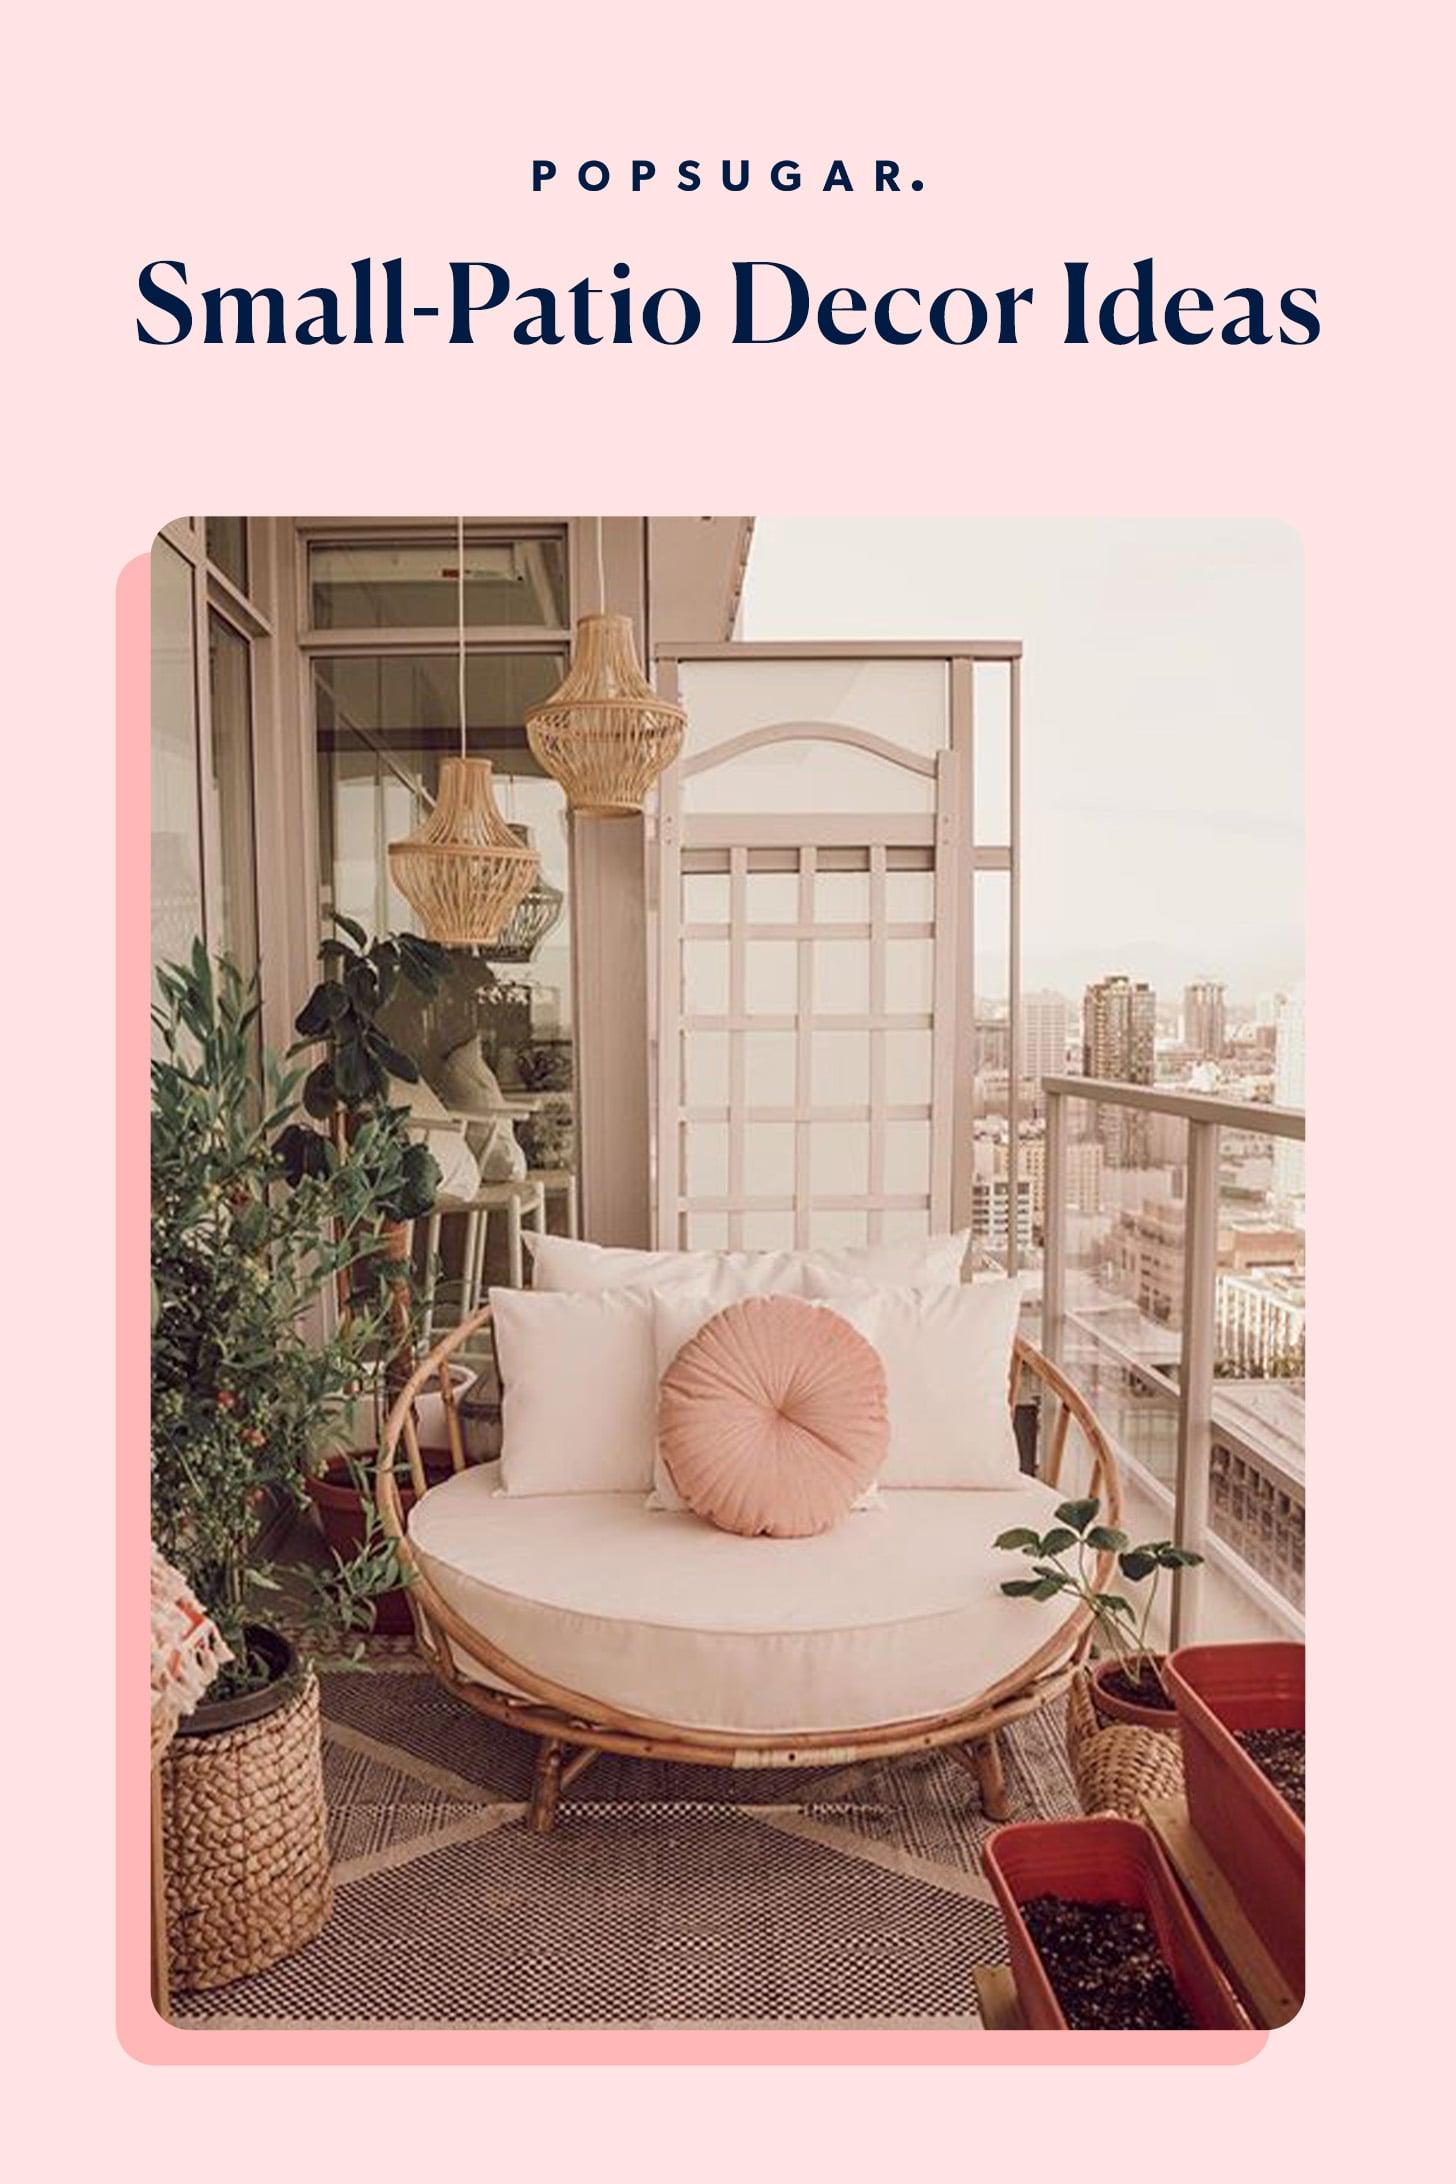 Small Patio Decor Ideas Popsugar Home